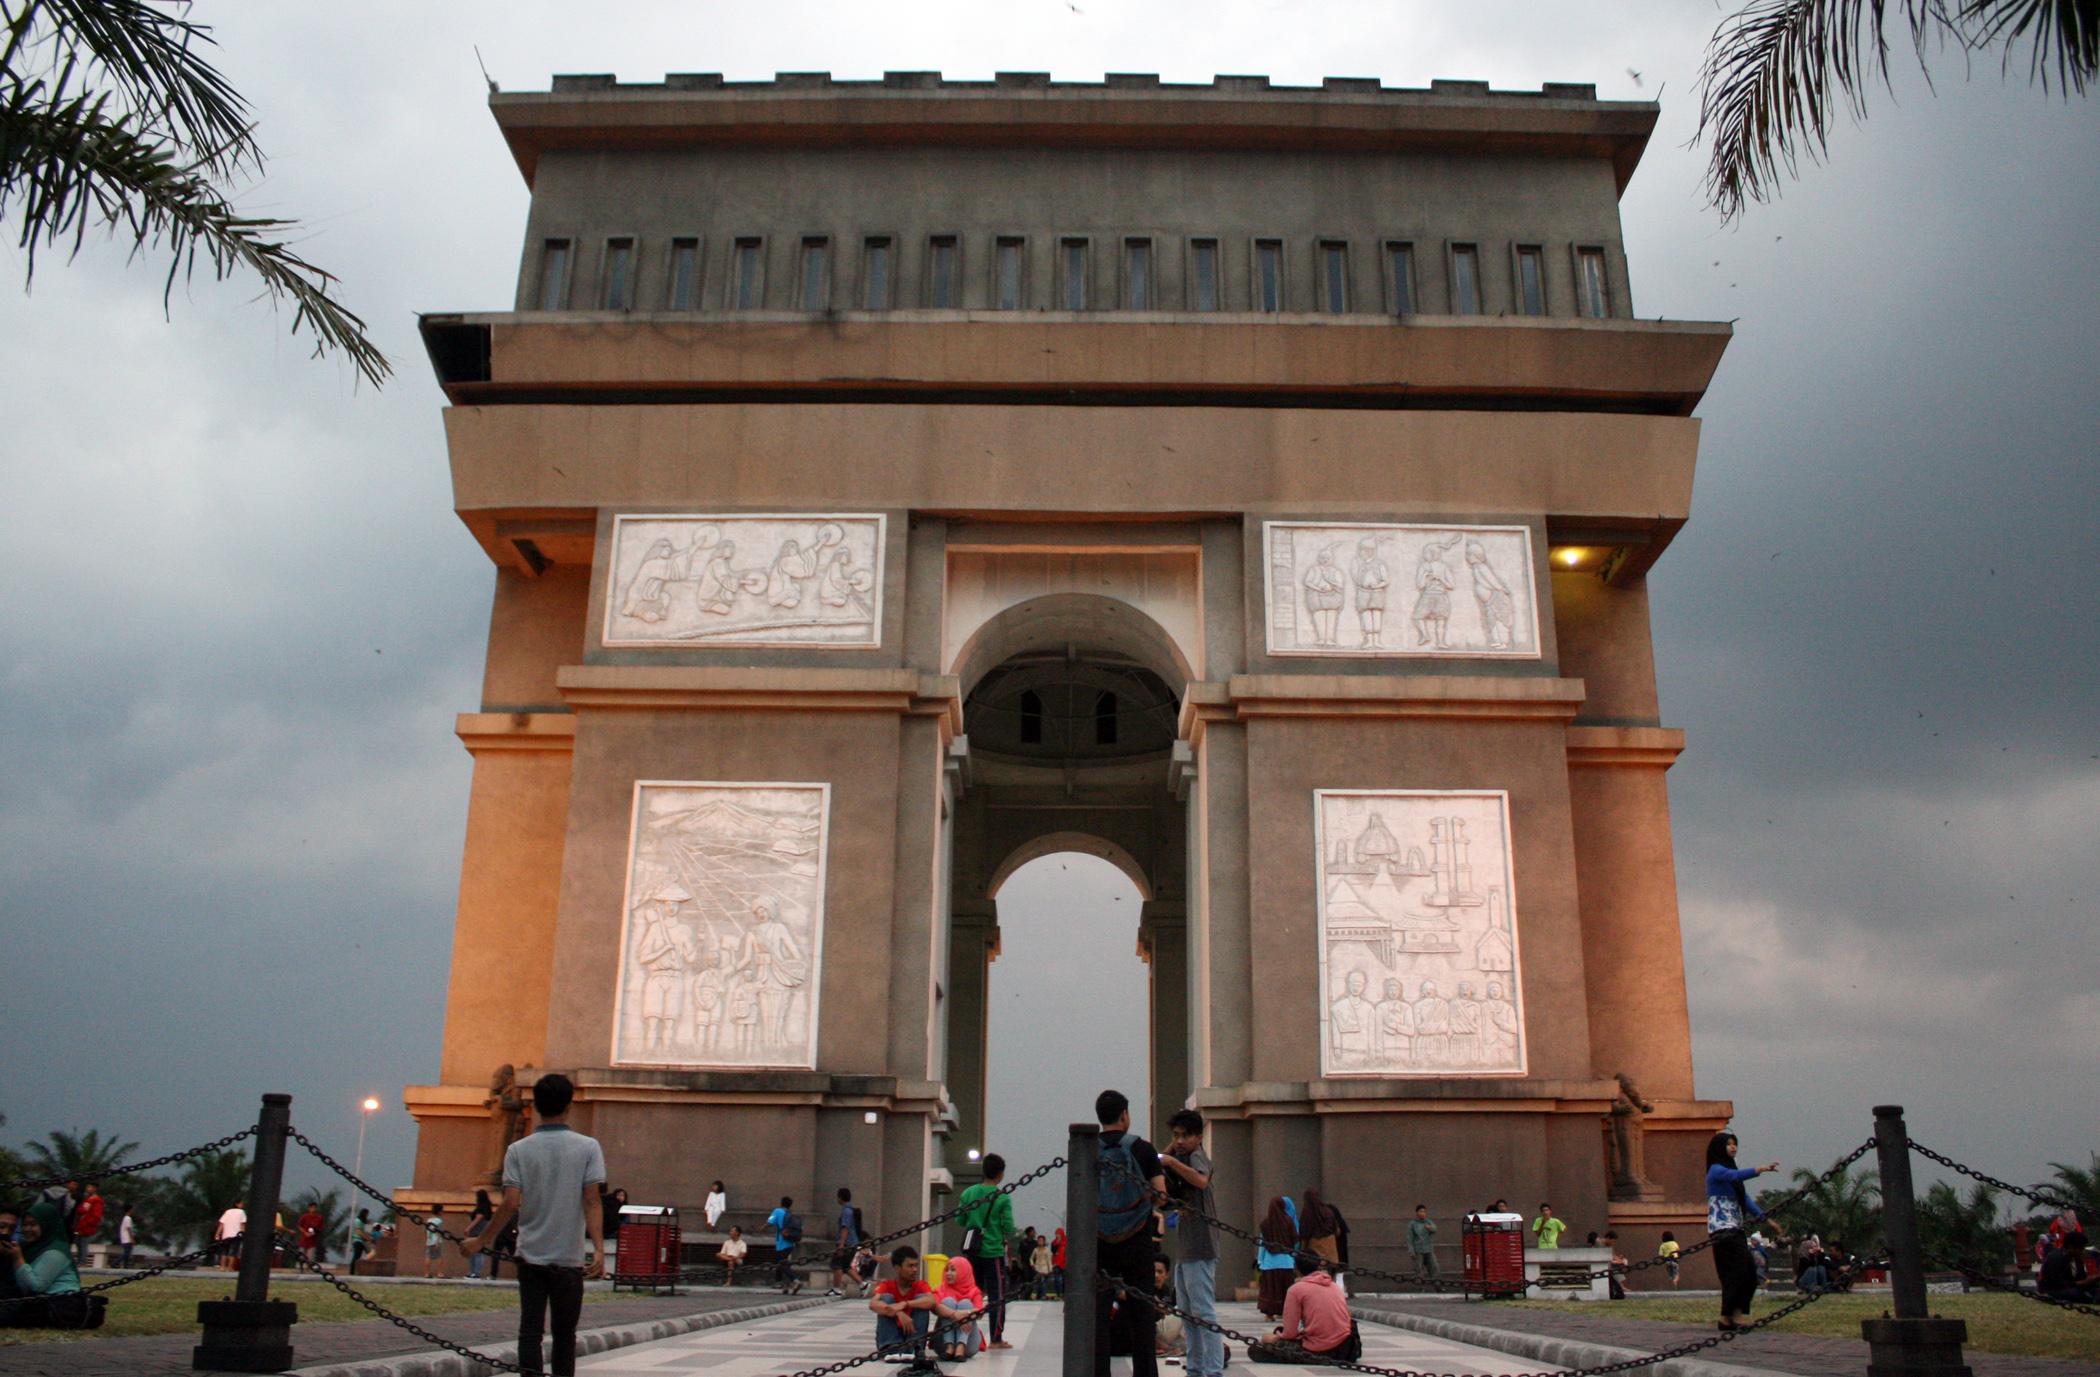 Monumen Berita Daerah Simpang Lima Gumul Kediri Syu Kab